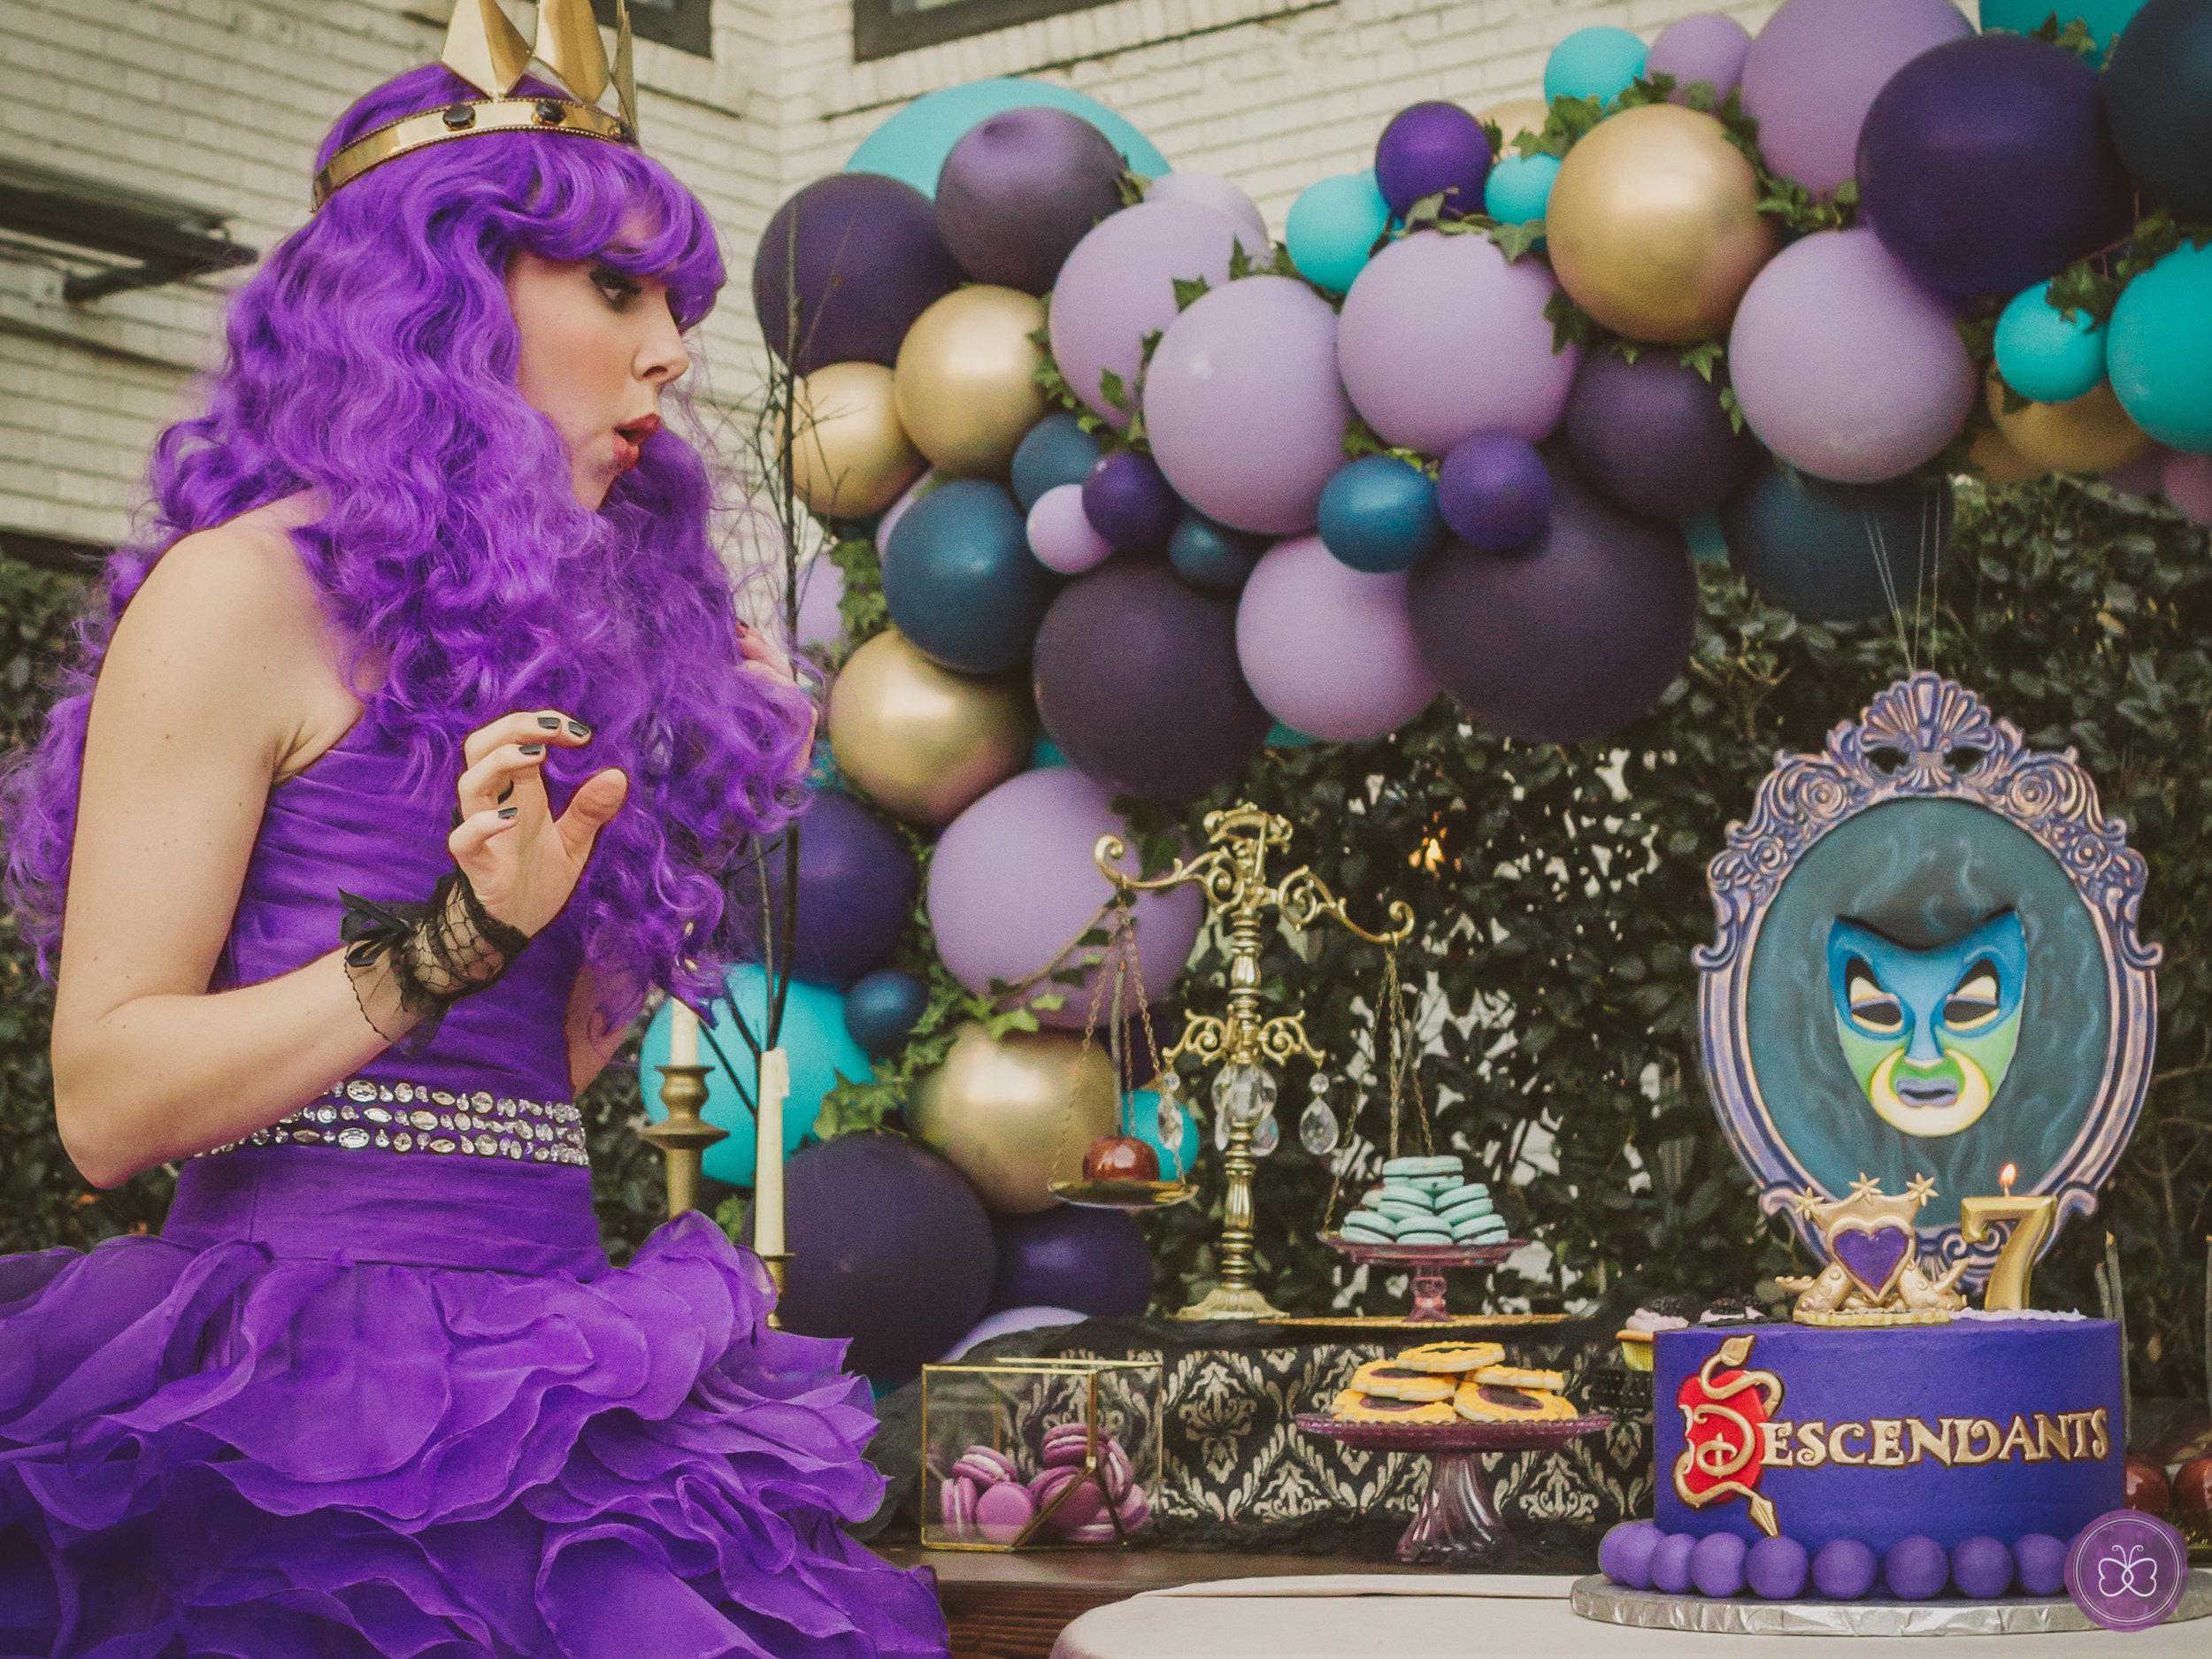 Beverly Wilshire Hotel Descendants Party 2018-7296.jpg